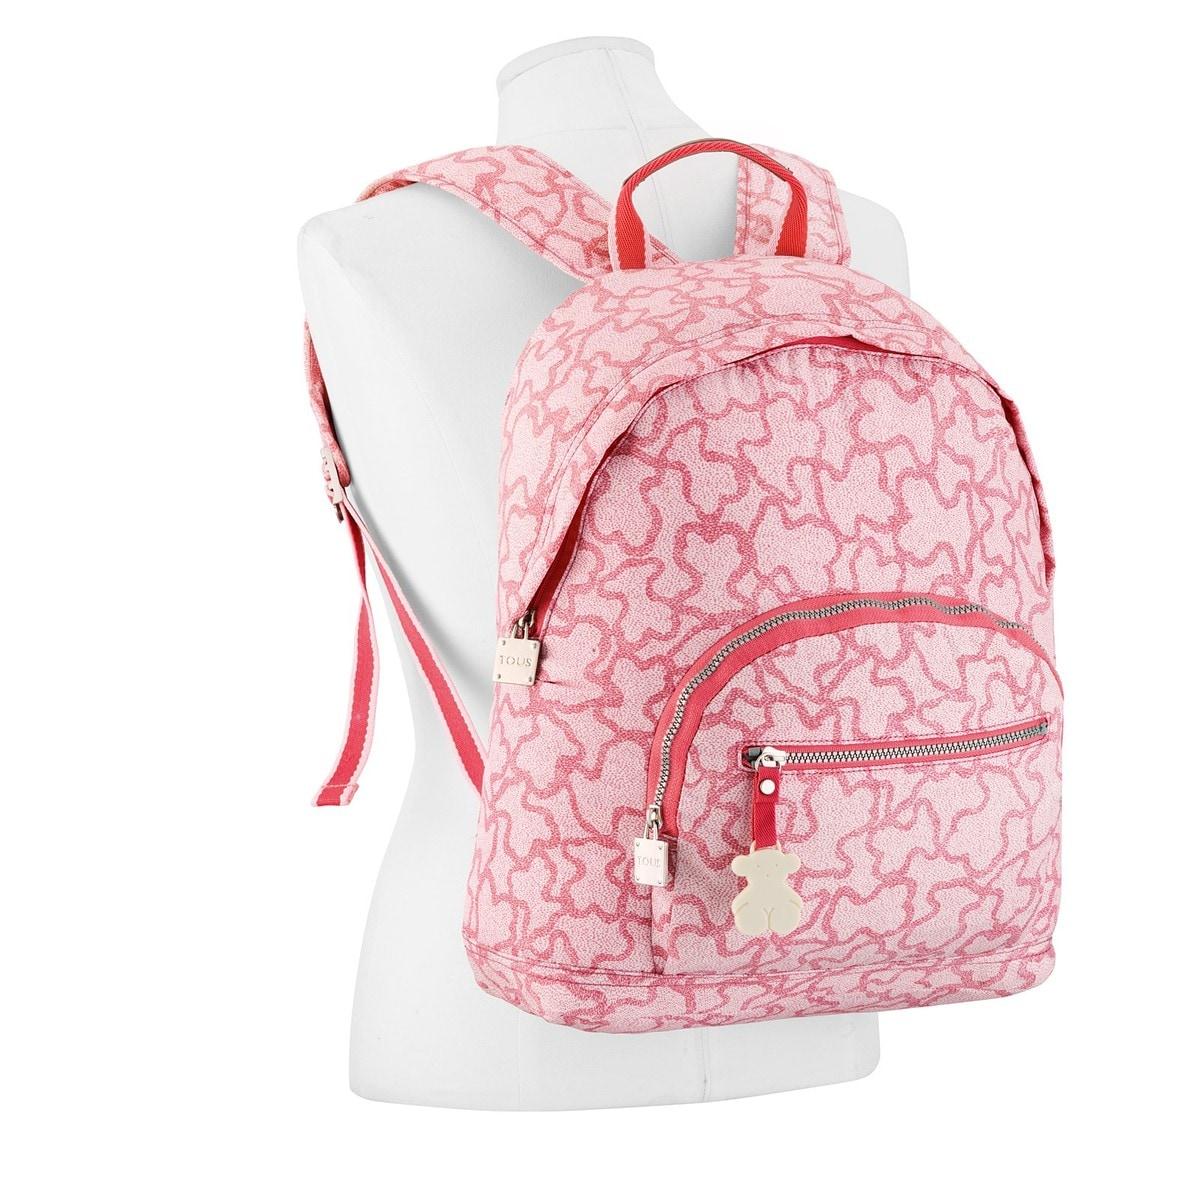 Mochila mediana Kaos New Colores en color rosa